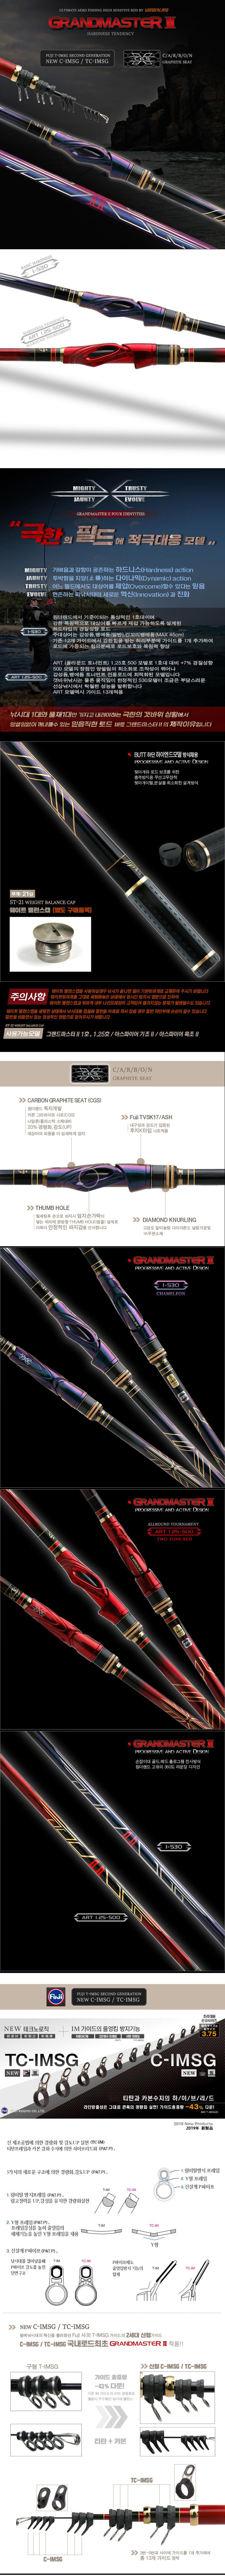 20190601-GRANDMASTER2-1750.jpg